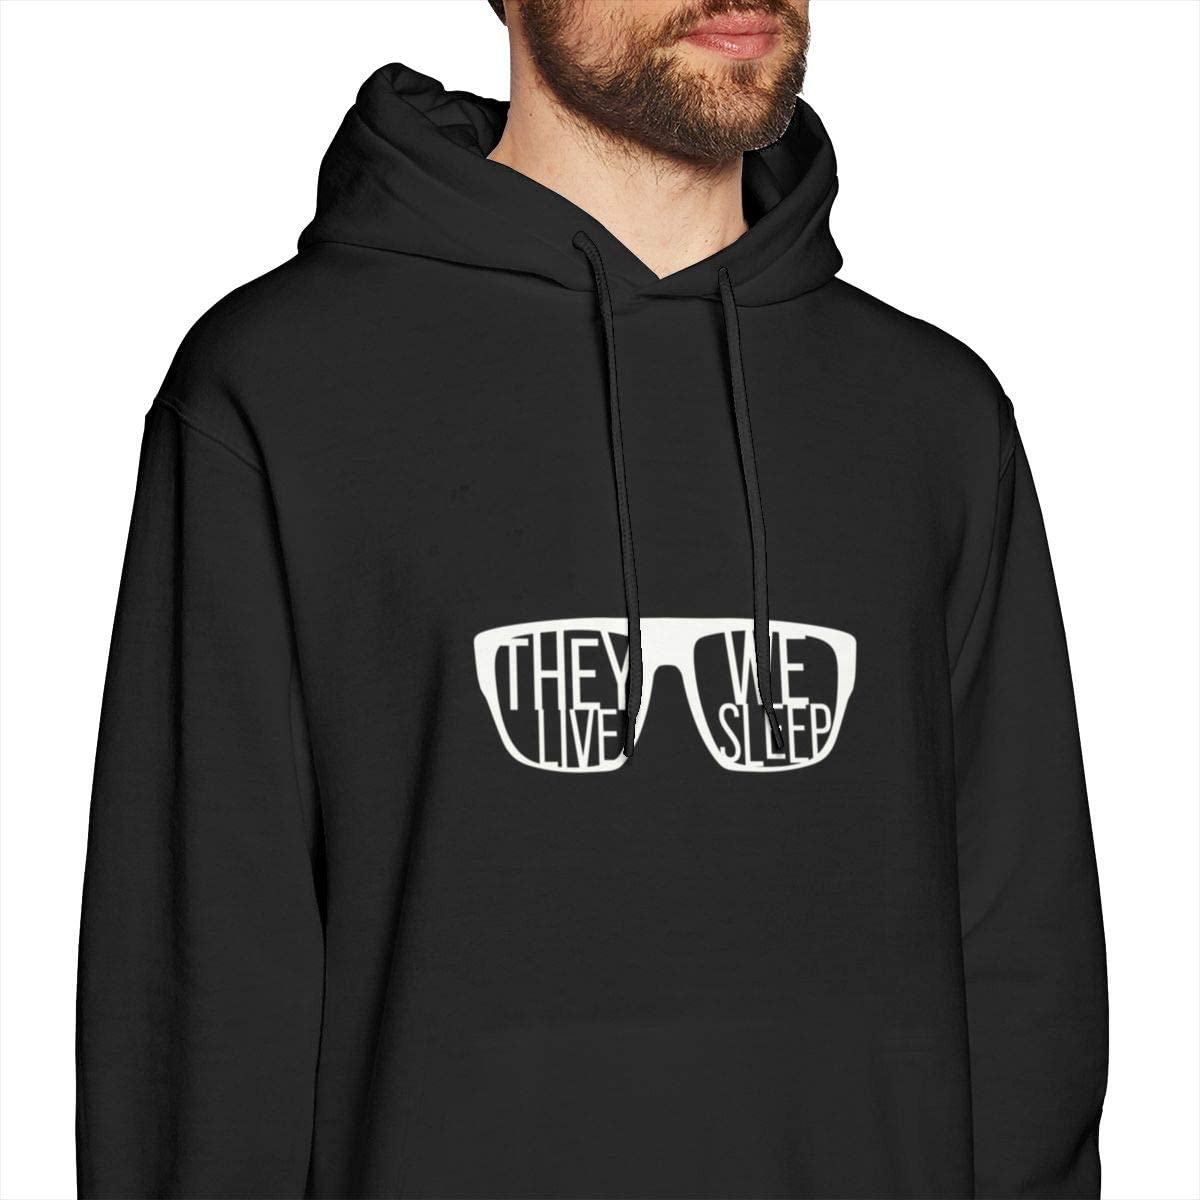 They Live,We Sleep Mens Hooded Sweatshirt Theme Printed Fashion Hoodie